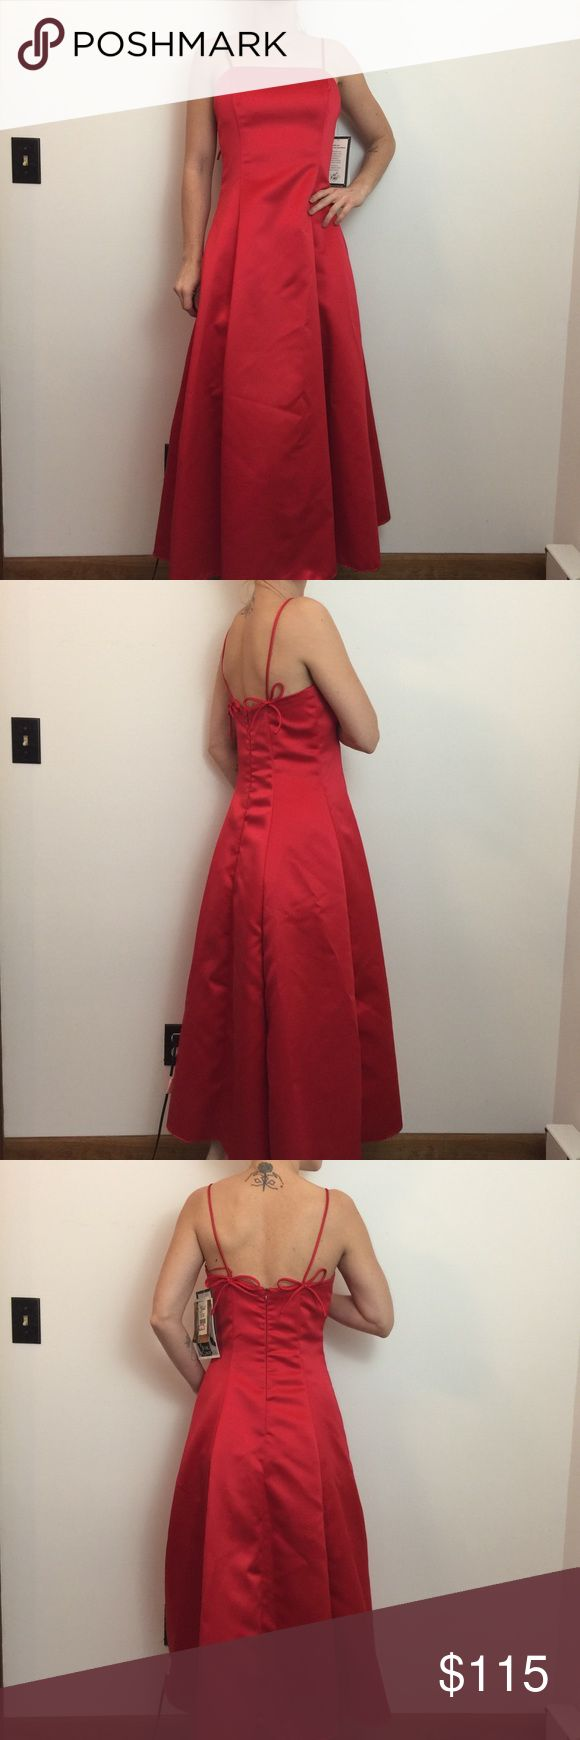 Jessica McClintock Dress Jessica McClintock Dress Jessica McClintock Dresses